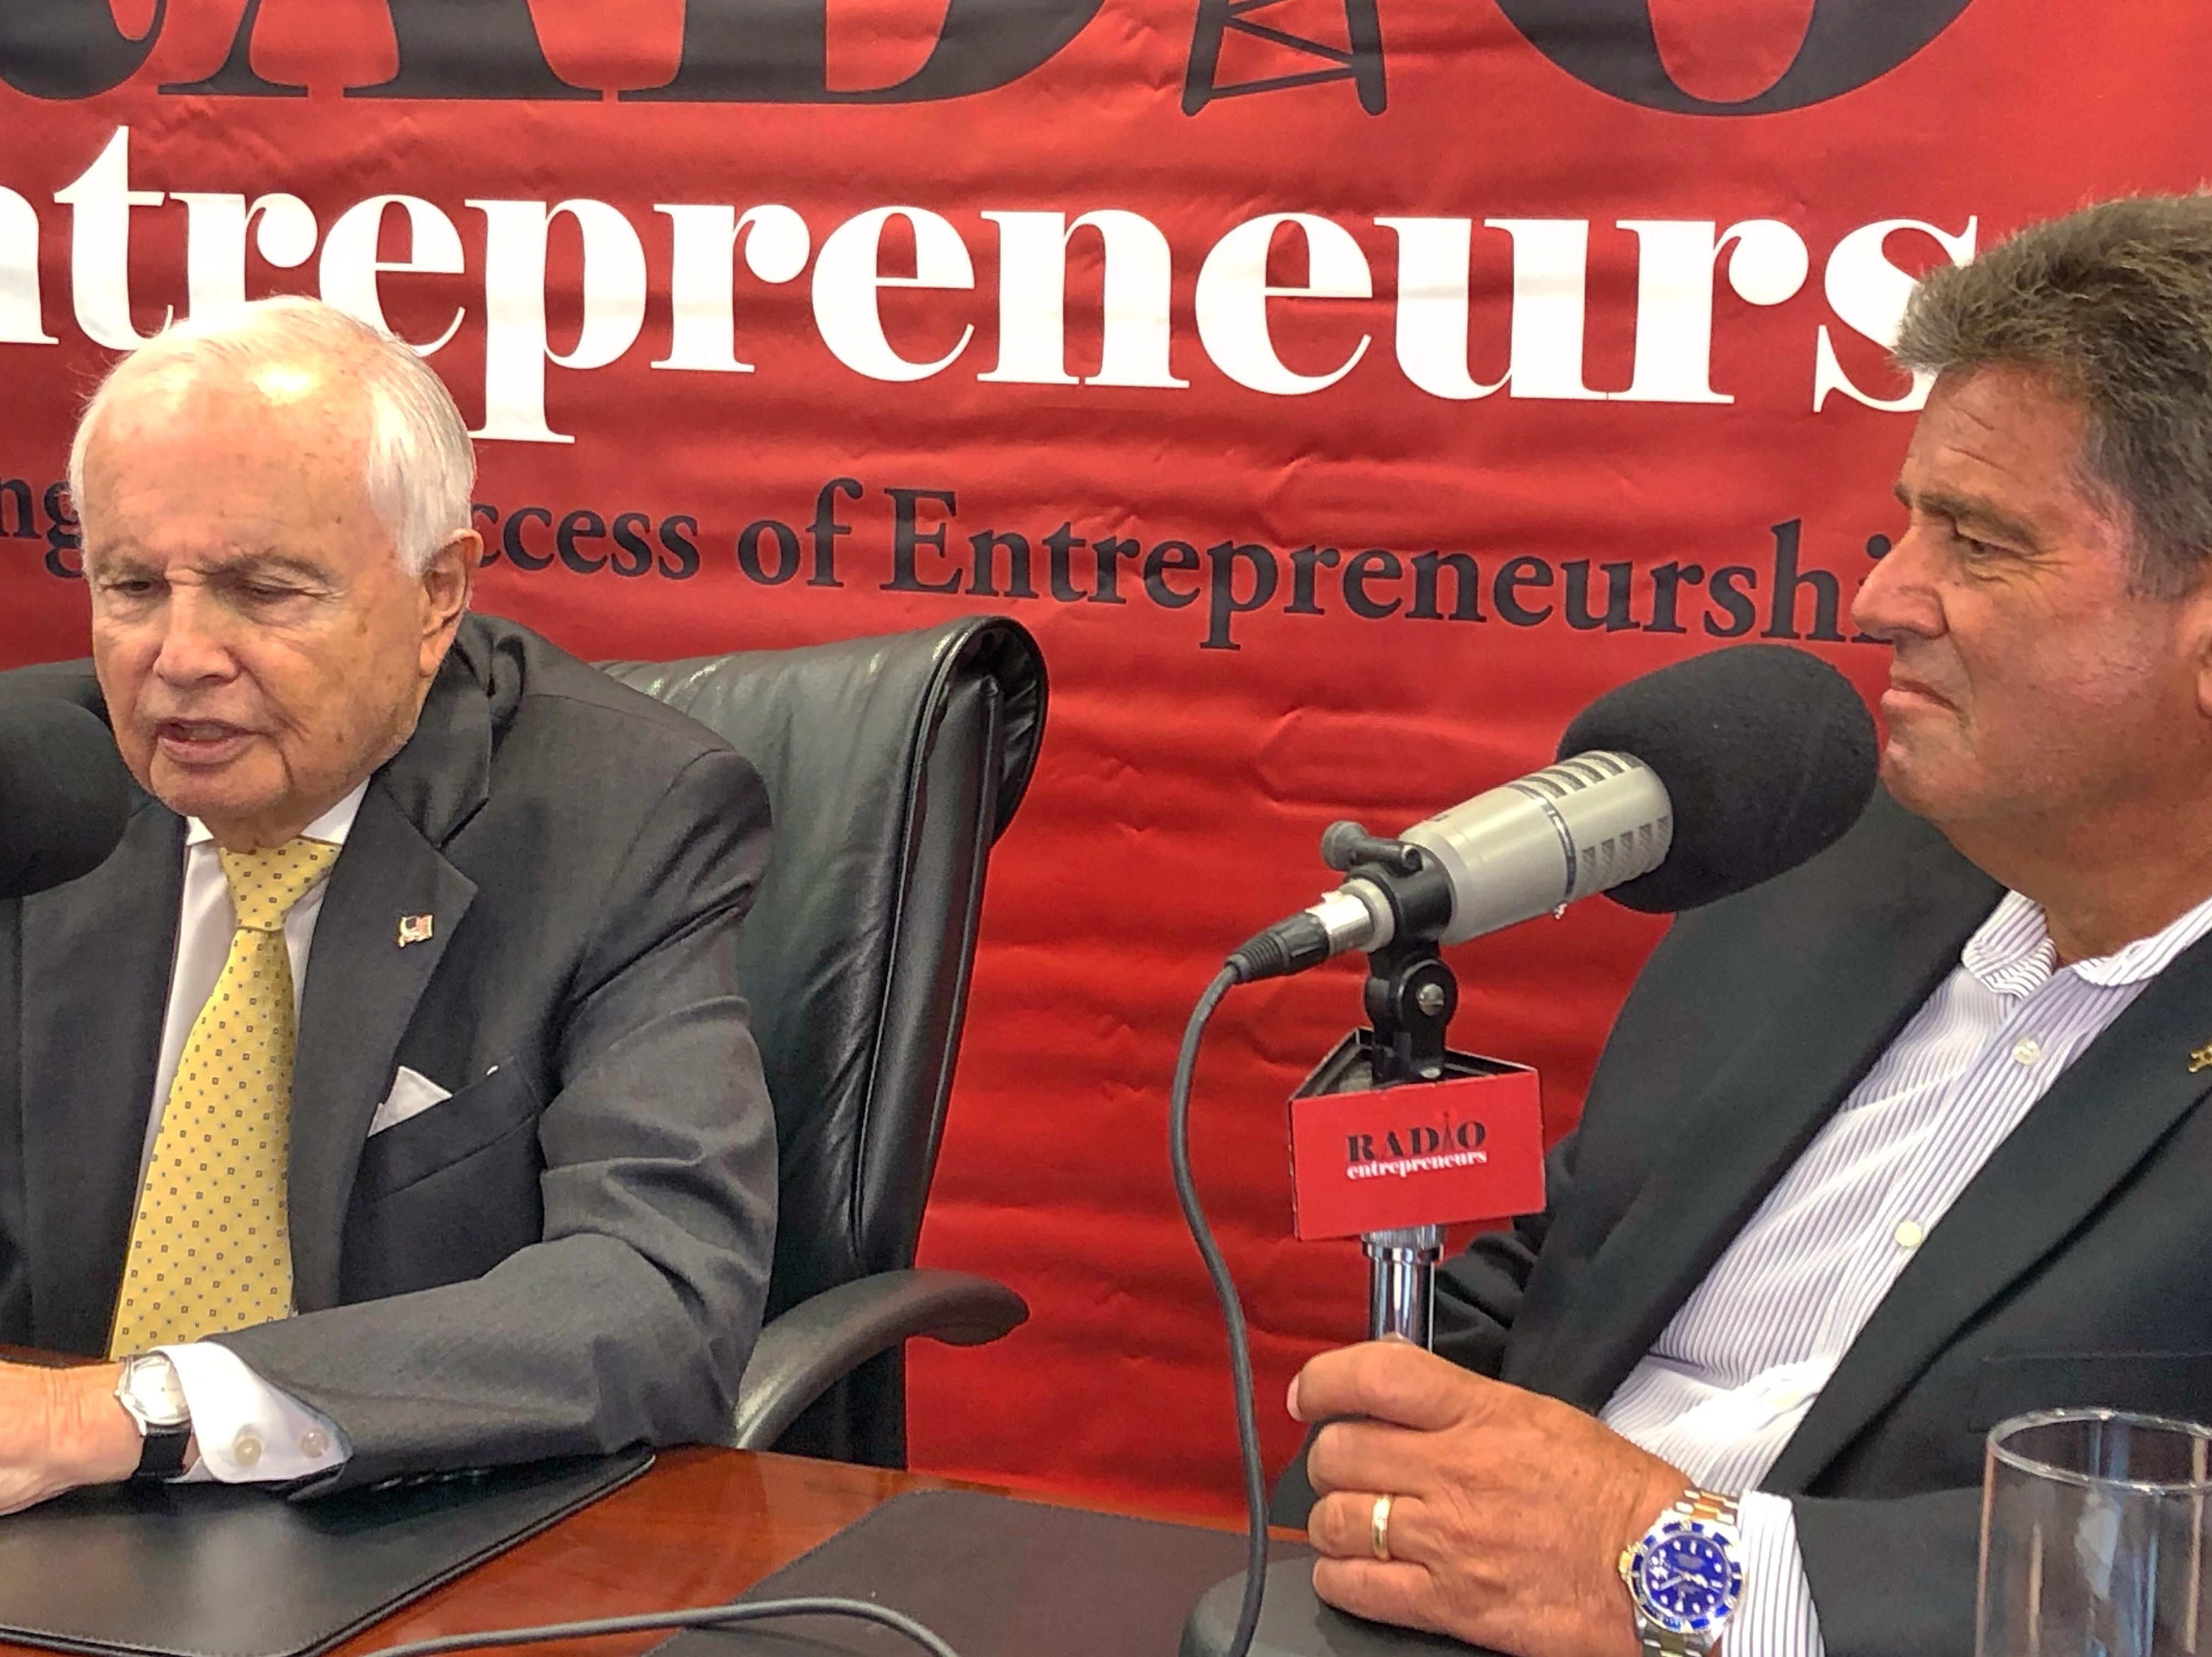 Al Faber and Joe DiLorenzo – Alan Faber Growth Strategies, LLC / MD Group